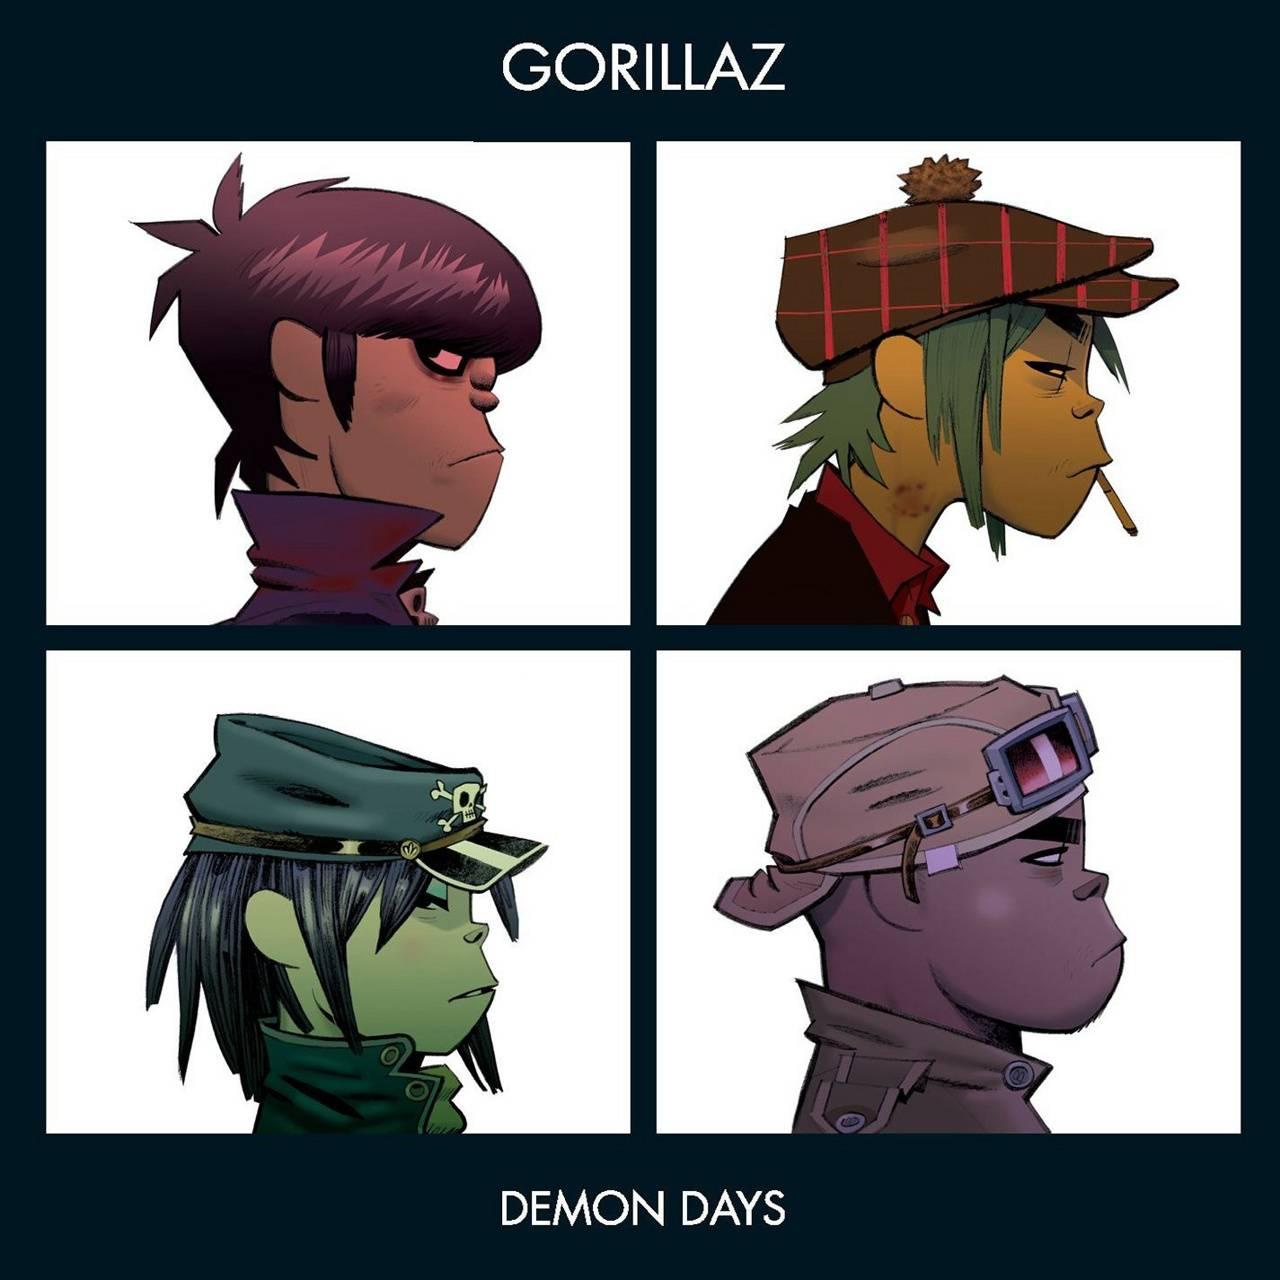 Gorillaz Demon Days Wallpaper